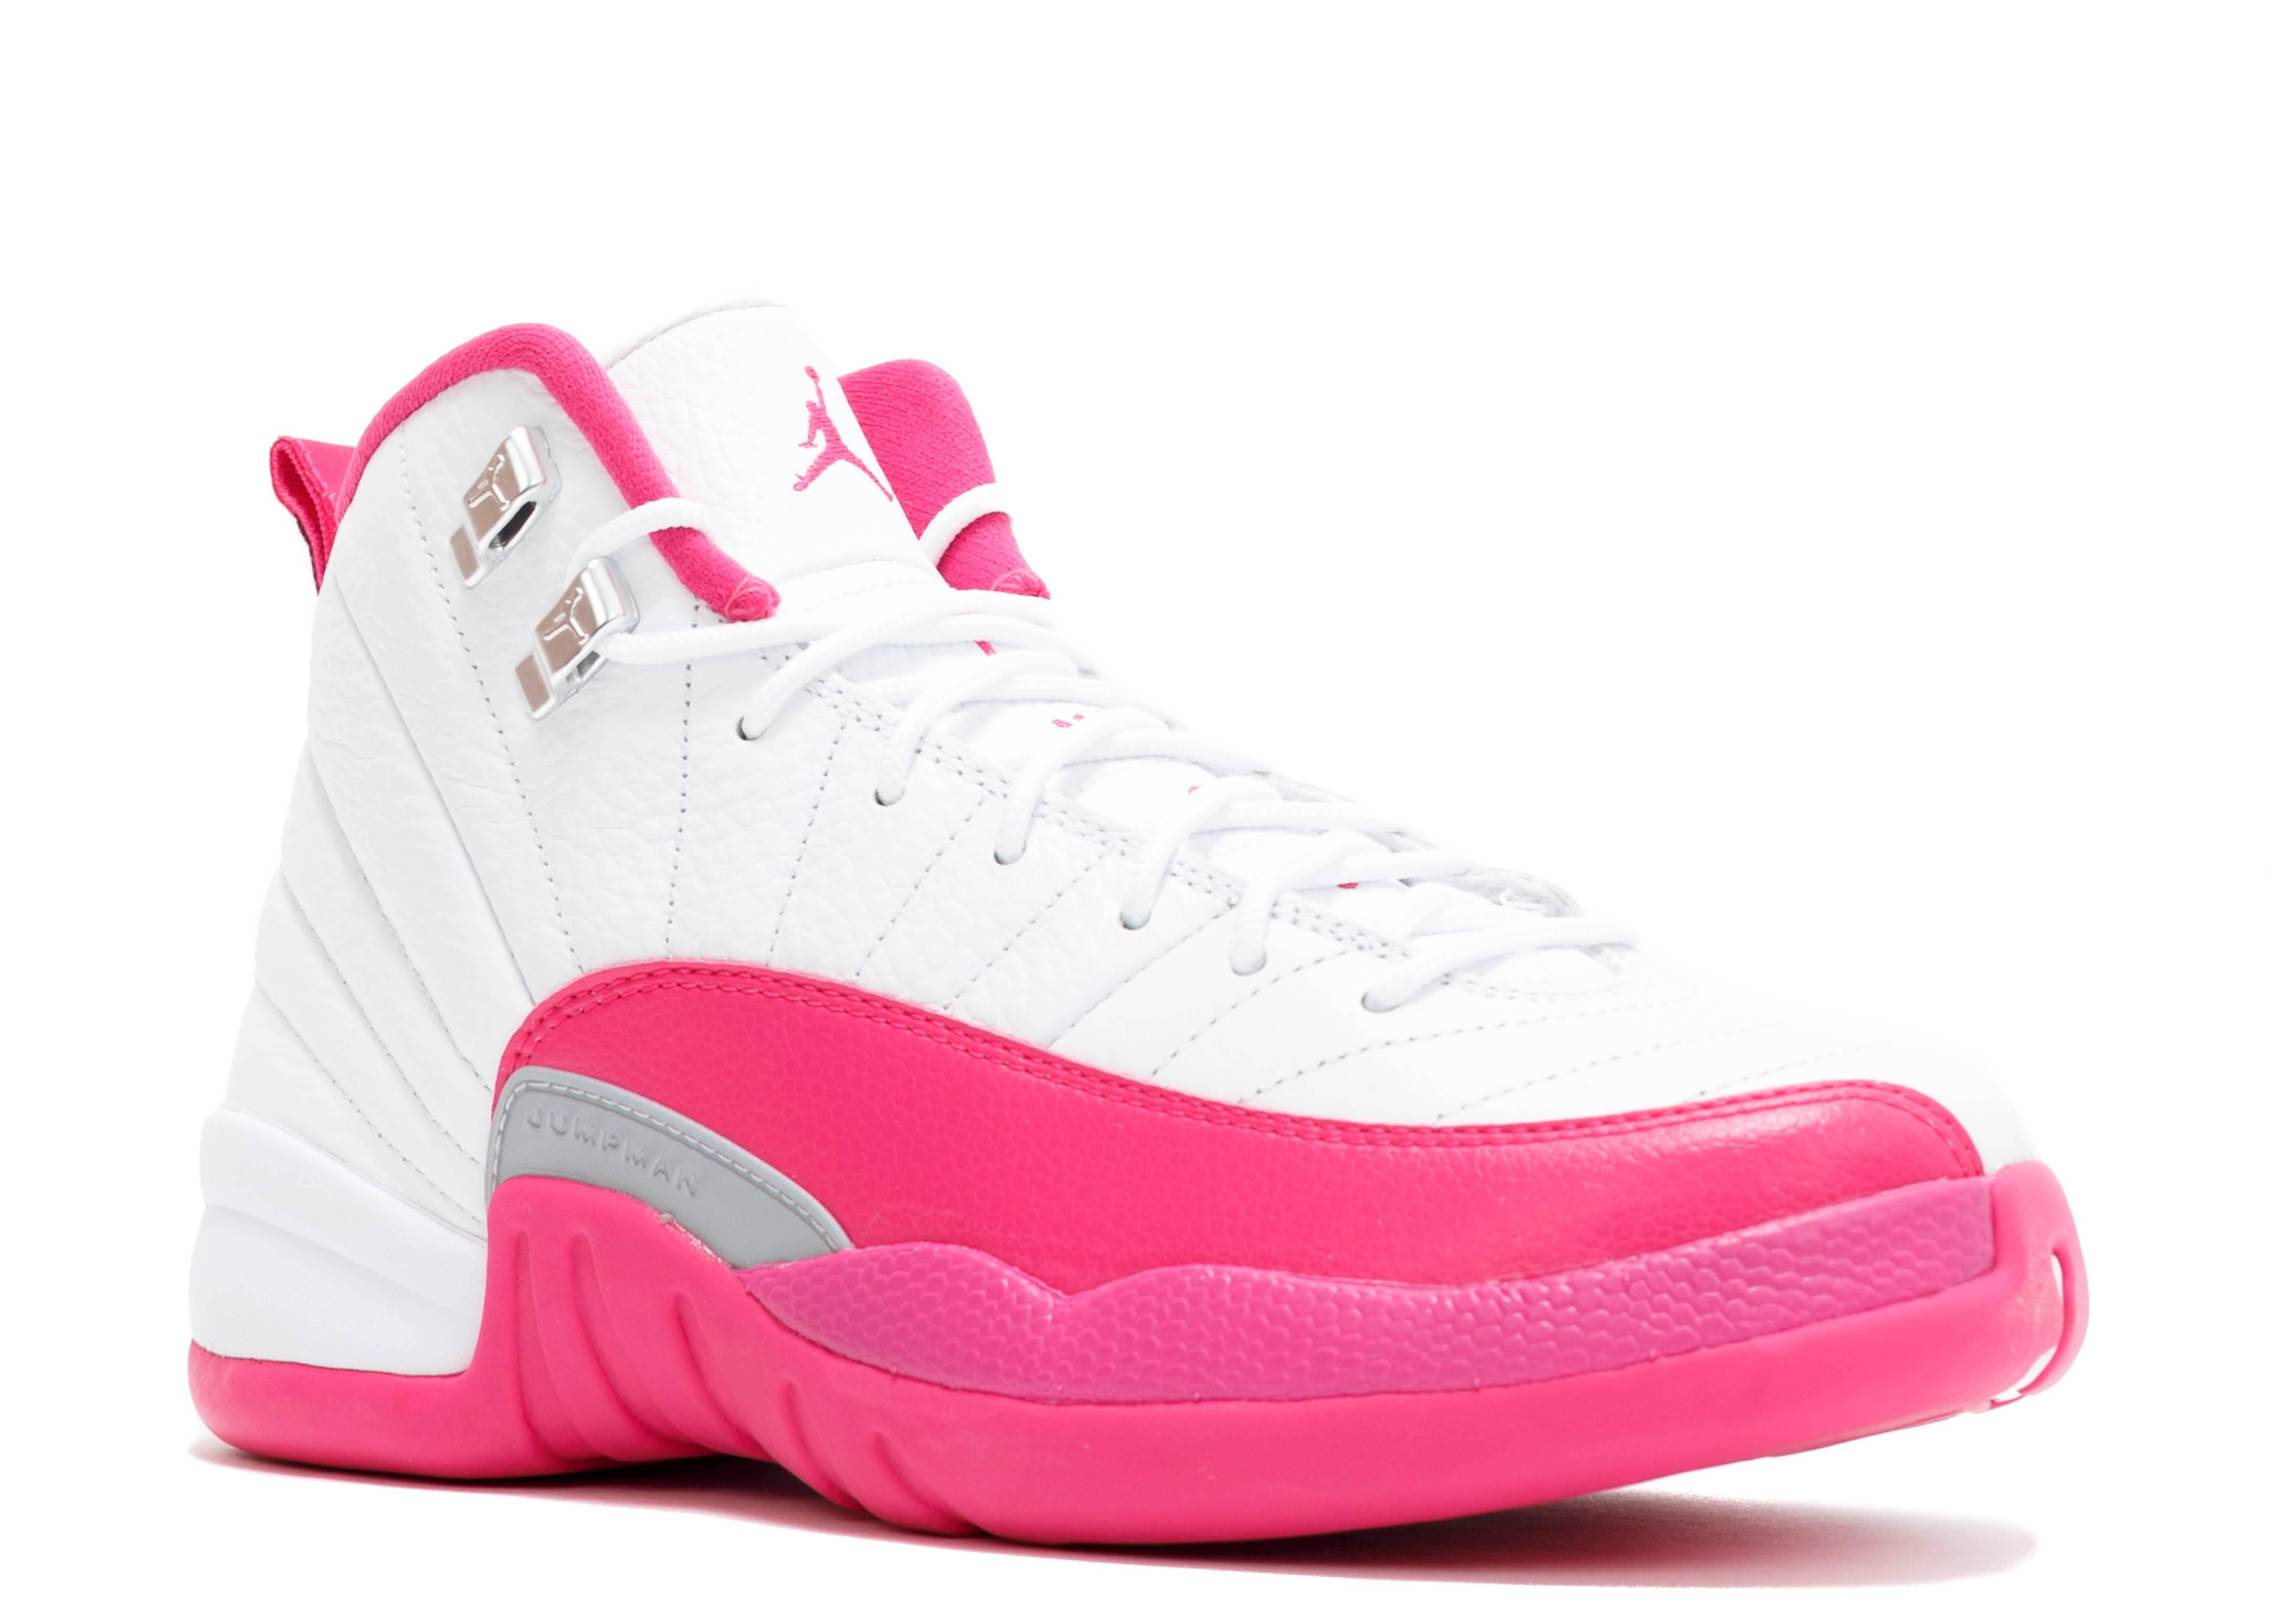 Nike Air Jordan Xii Valentine